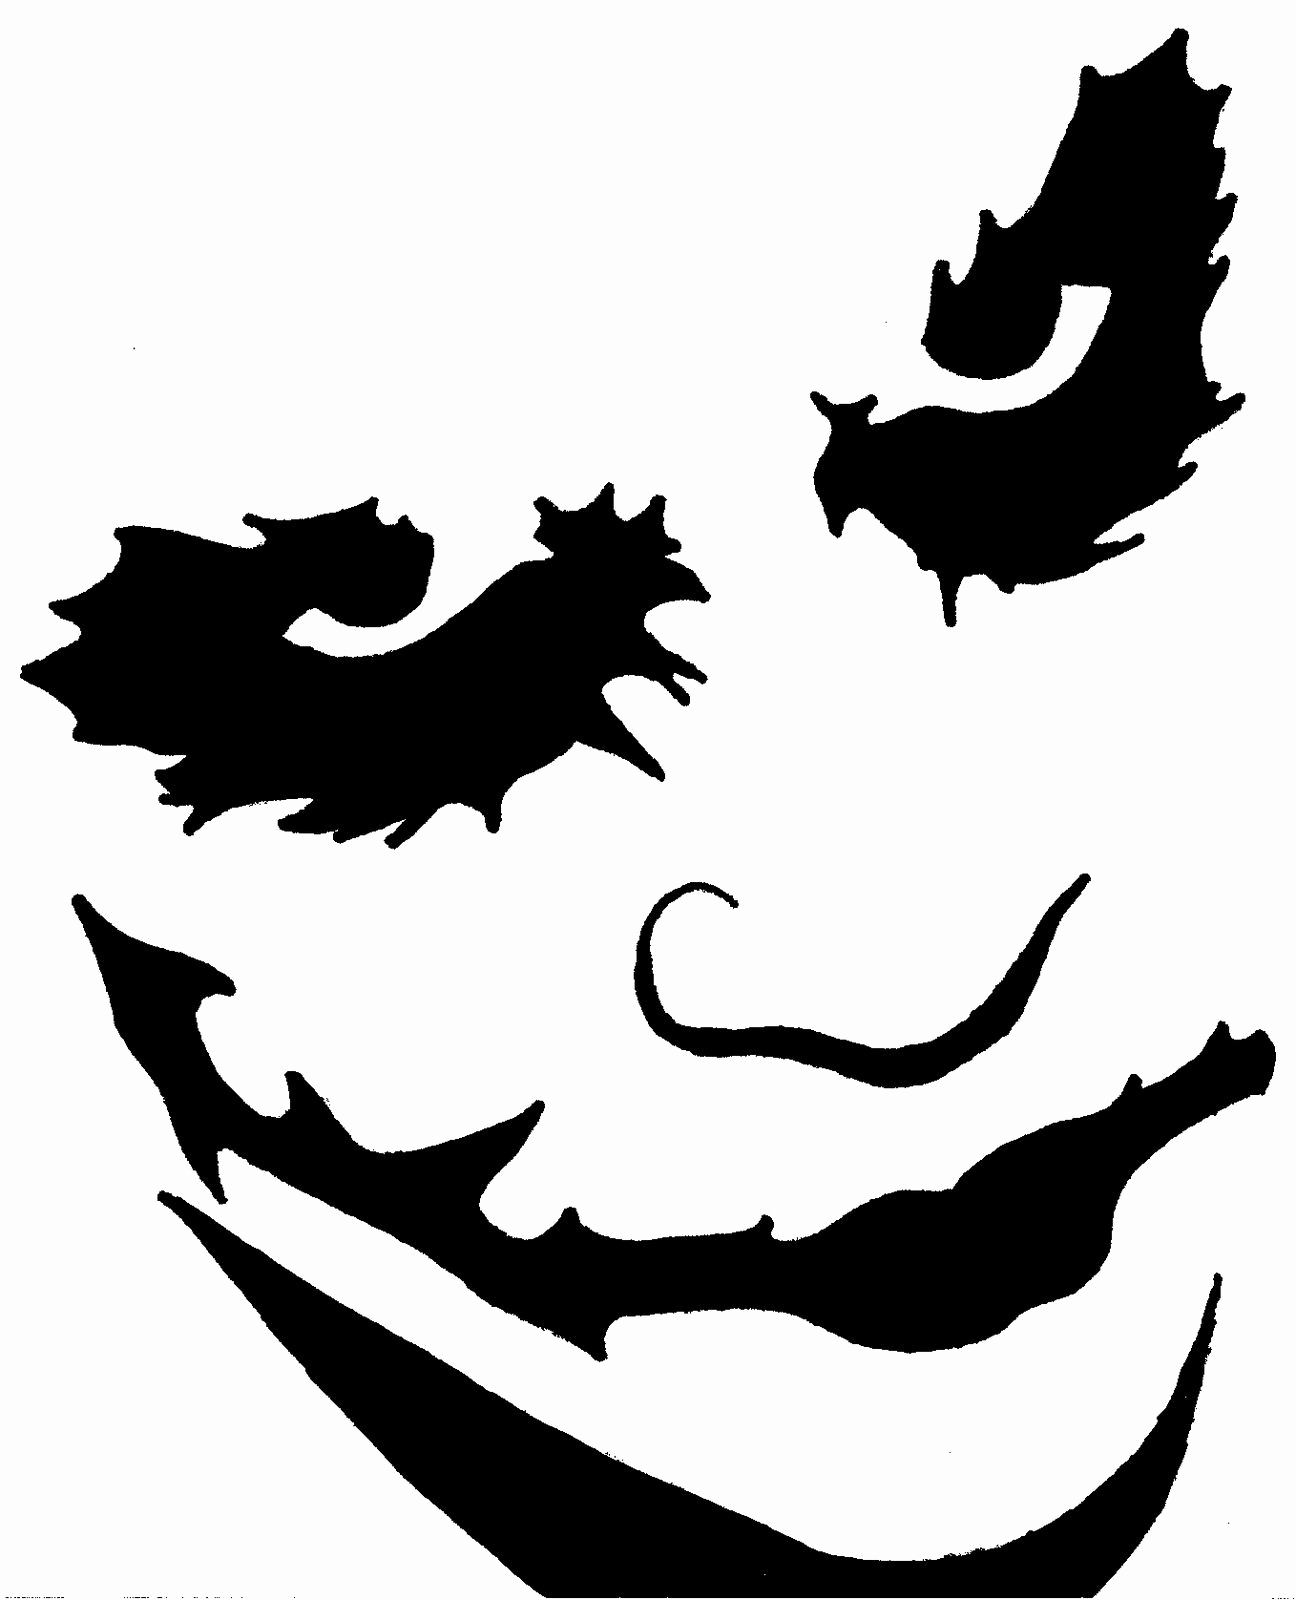 Free Halloween Pumpkin Carving Templates Printable 2018 | Pumpkin - Free Printable Scary Pumpkin Patterns